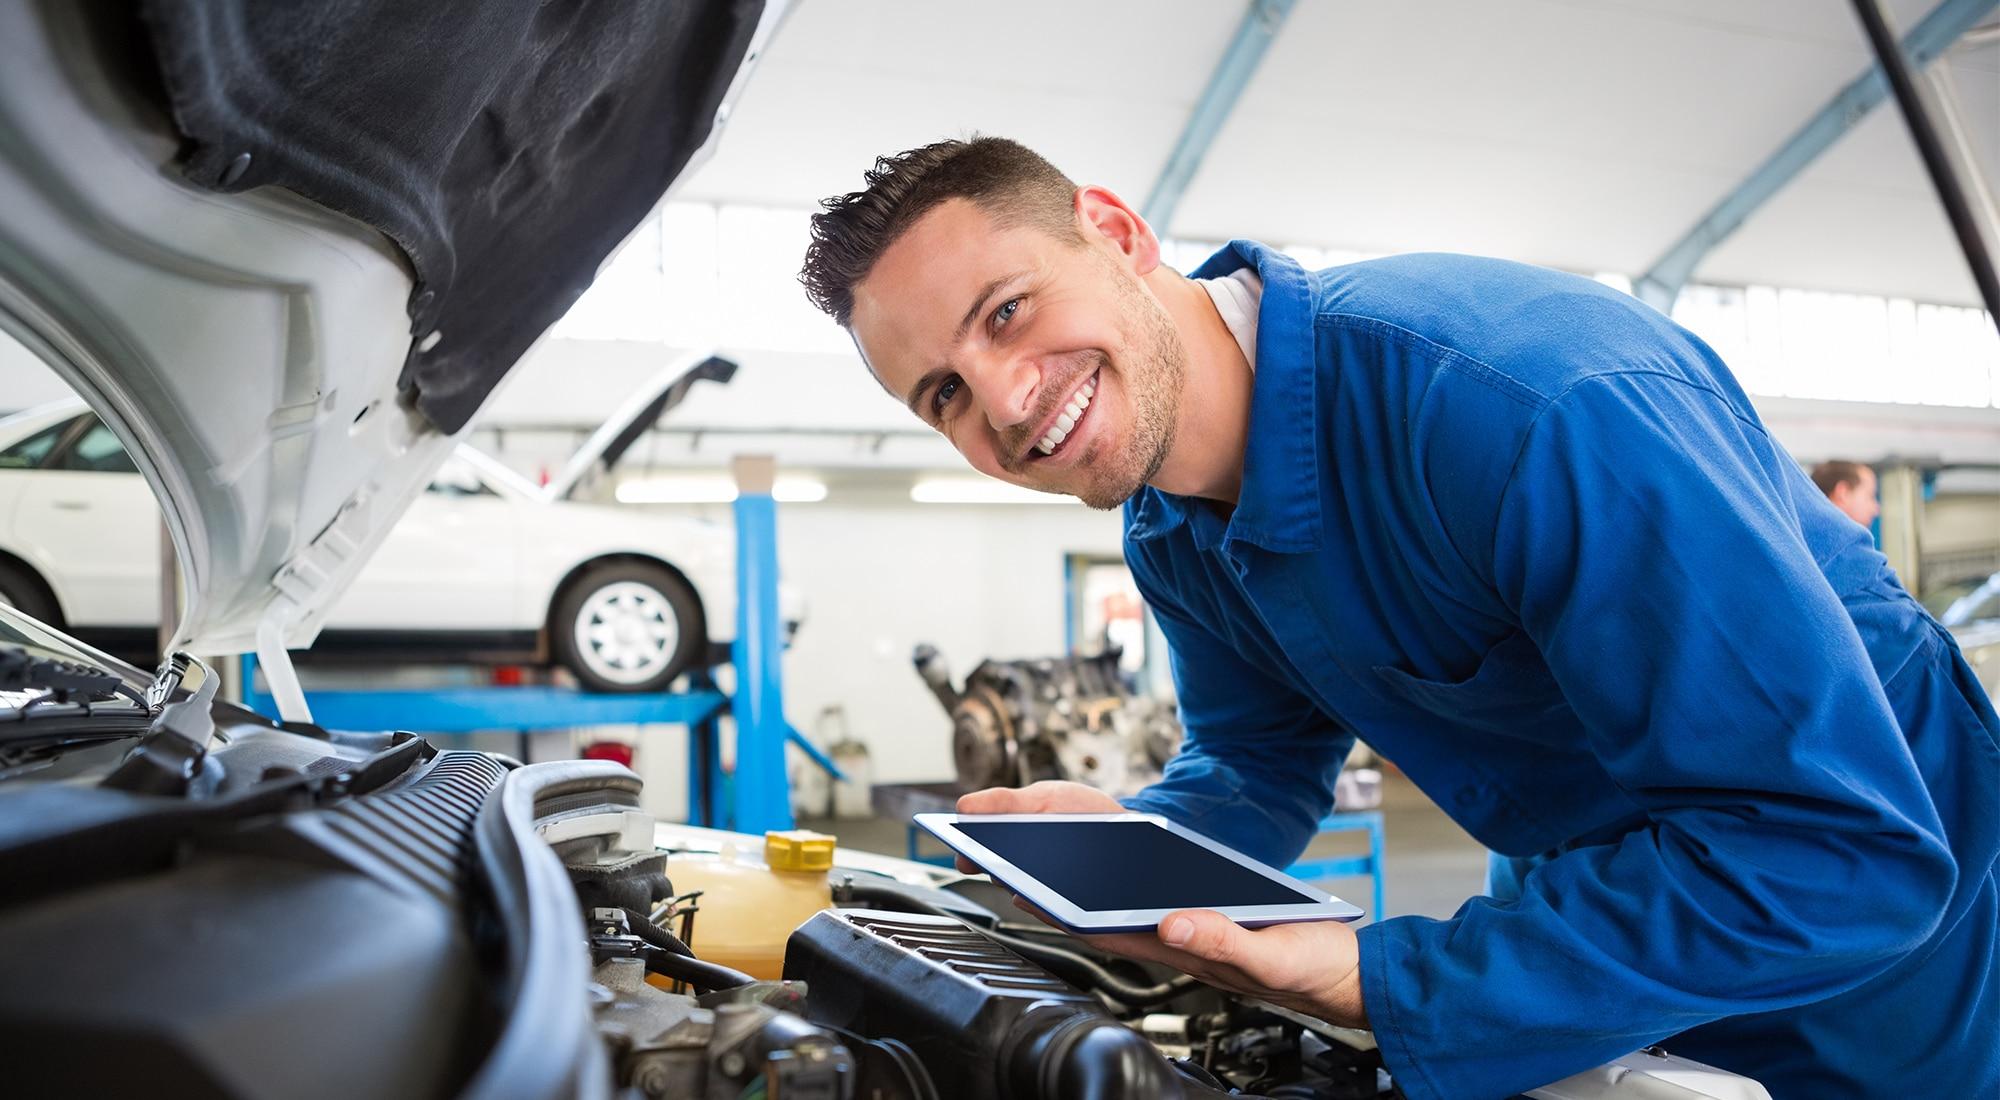 Bilmekaniker utfører service, EU-kontroll